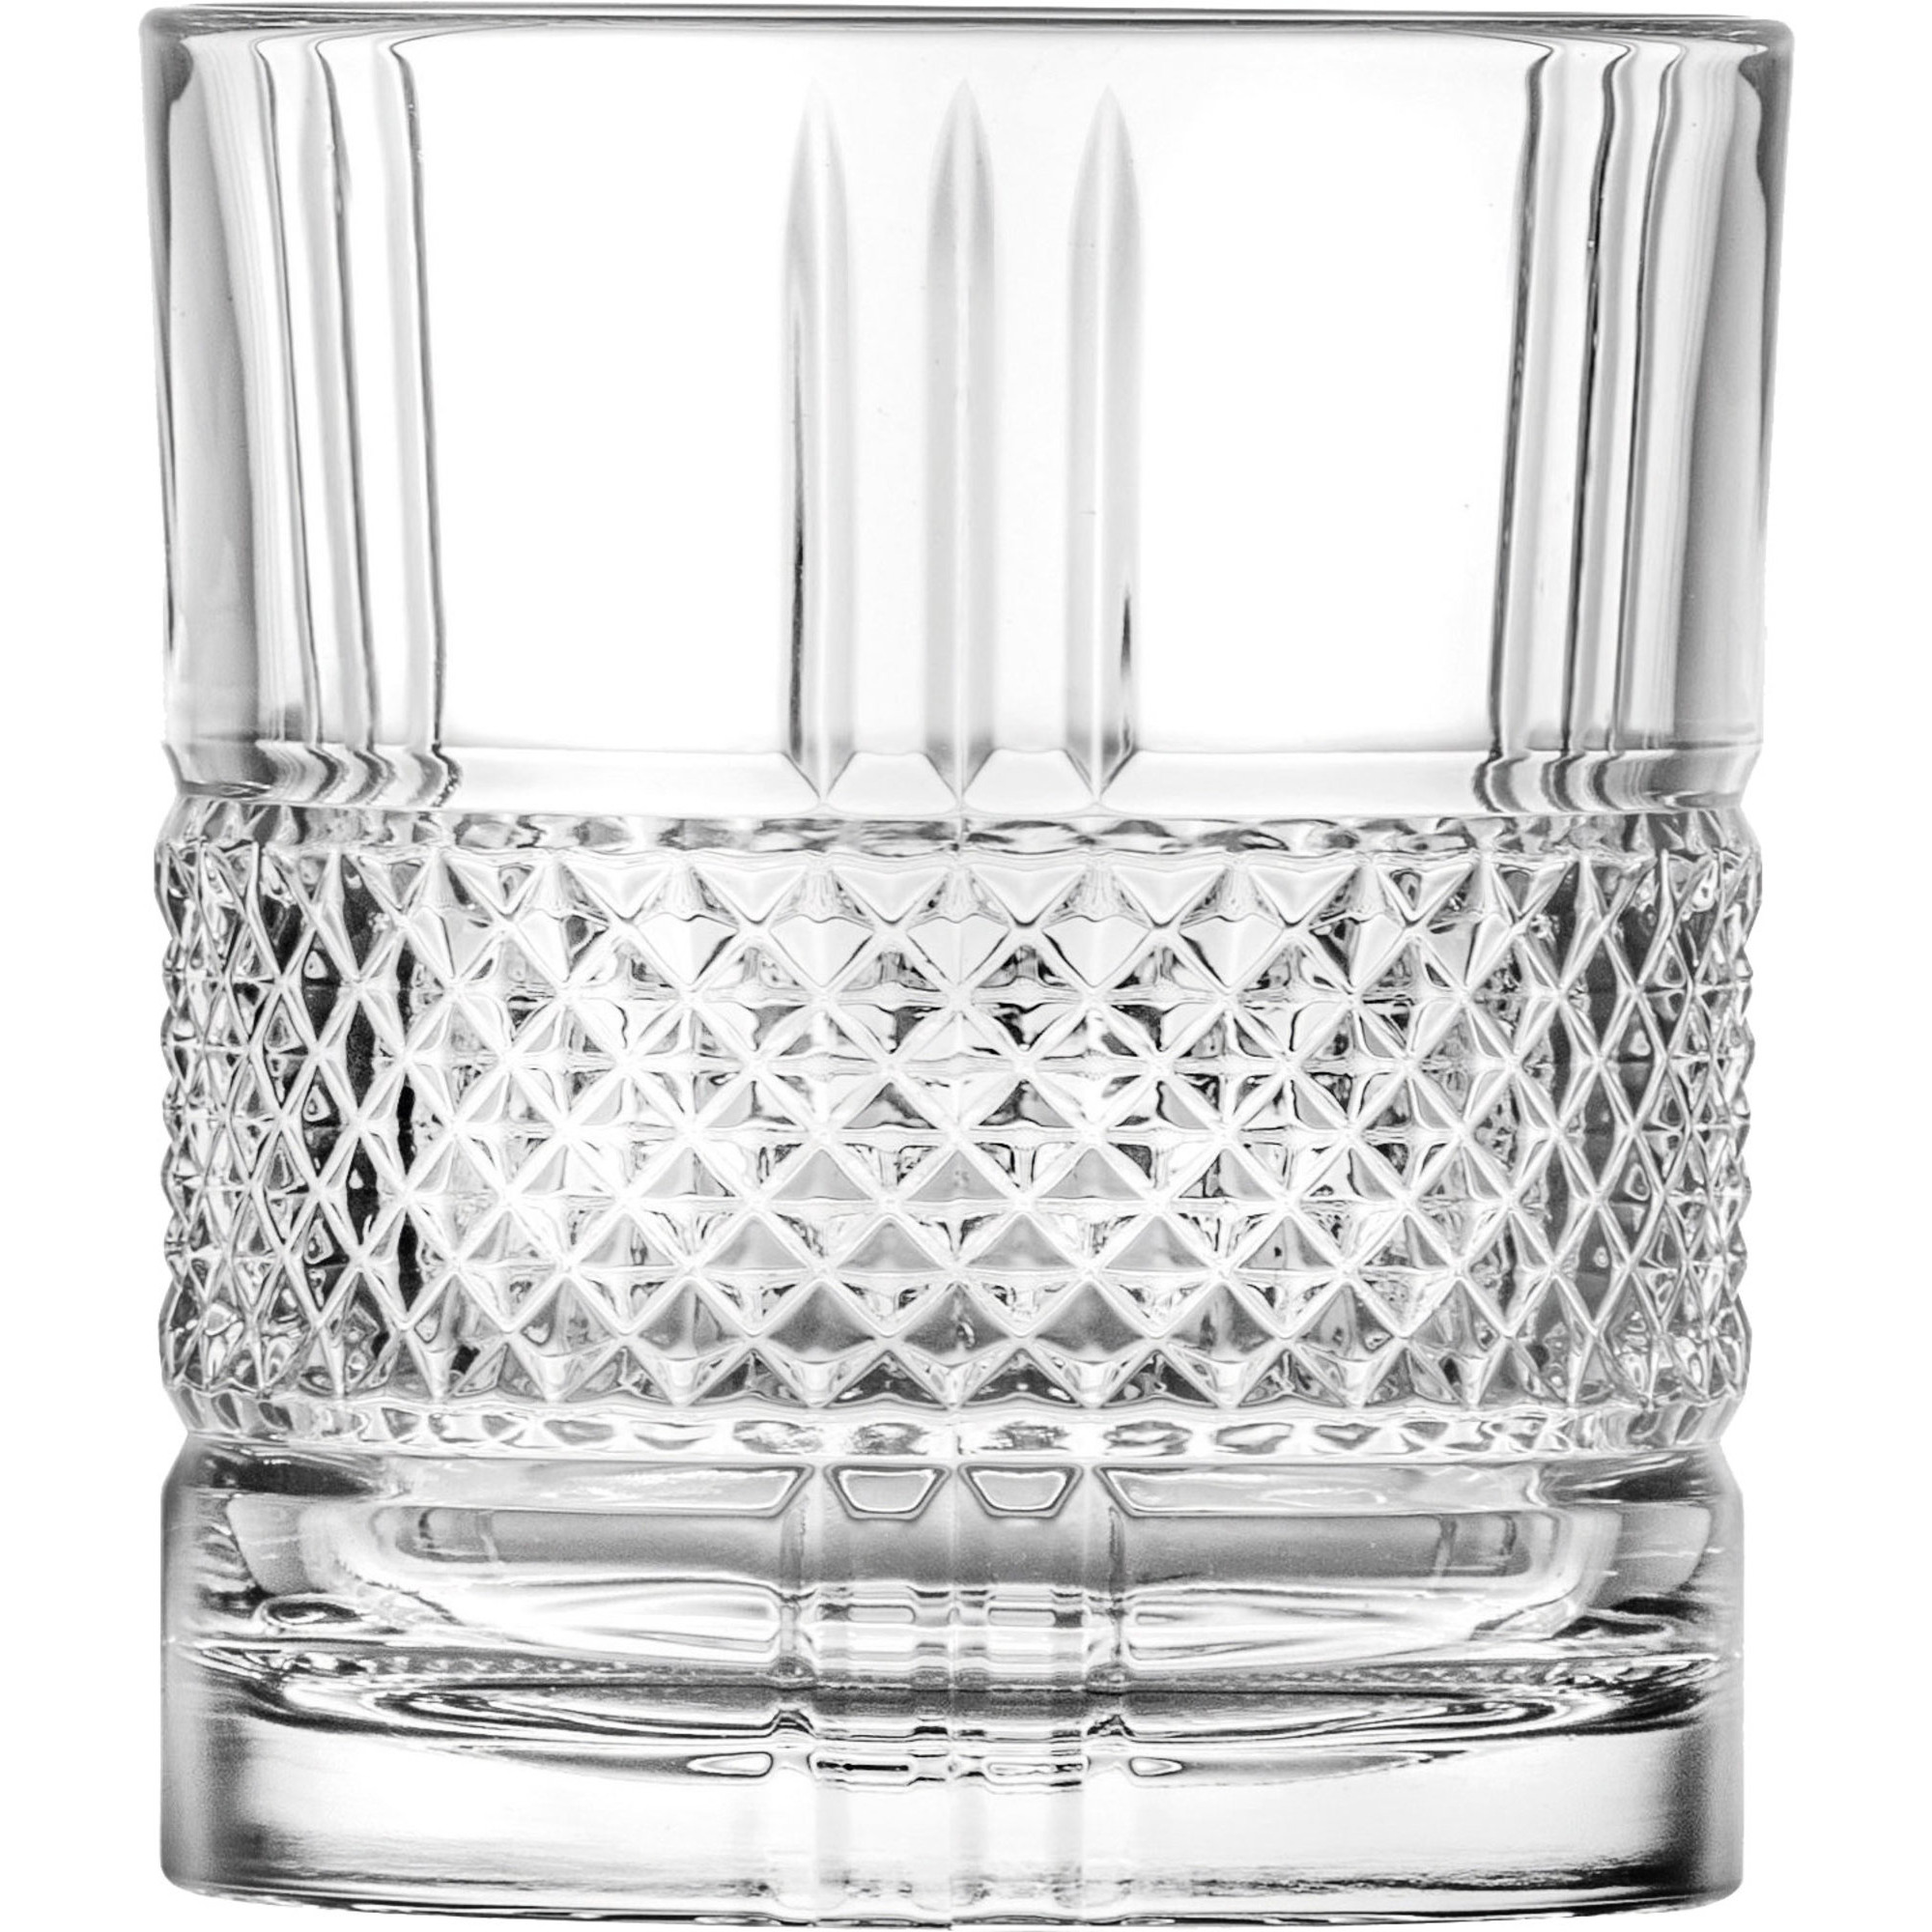 Lyngby Glas Brilliante Whiskyglas 6 st